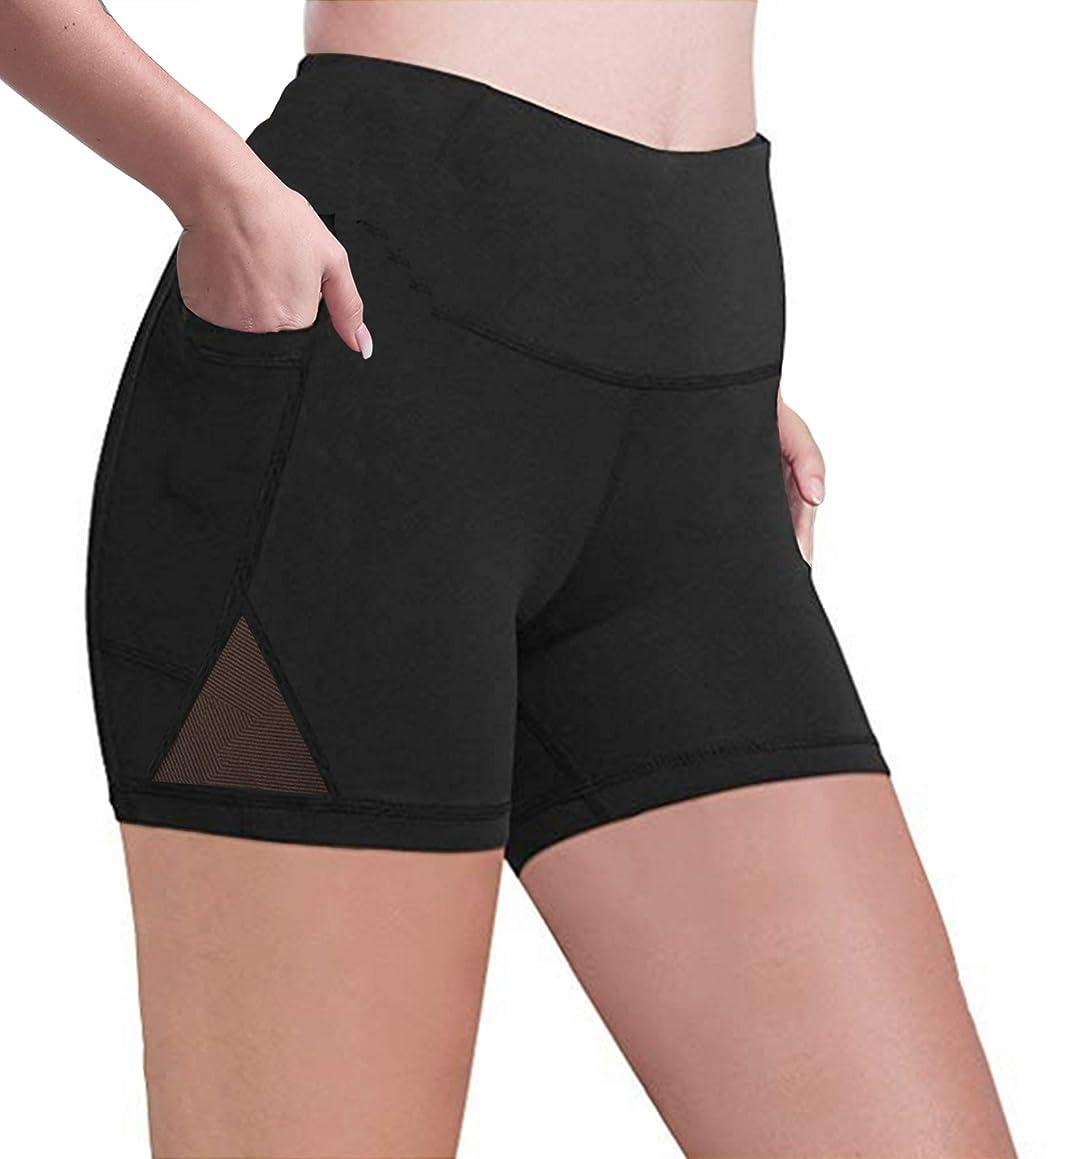 Kipro Workout Running Shorts for Women Compression Fitness Short Pants Side Pocket